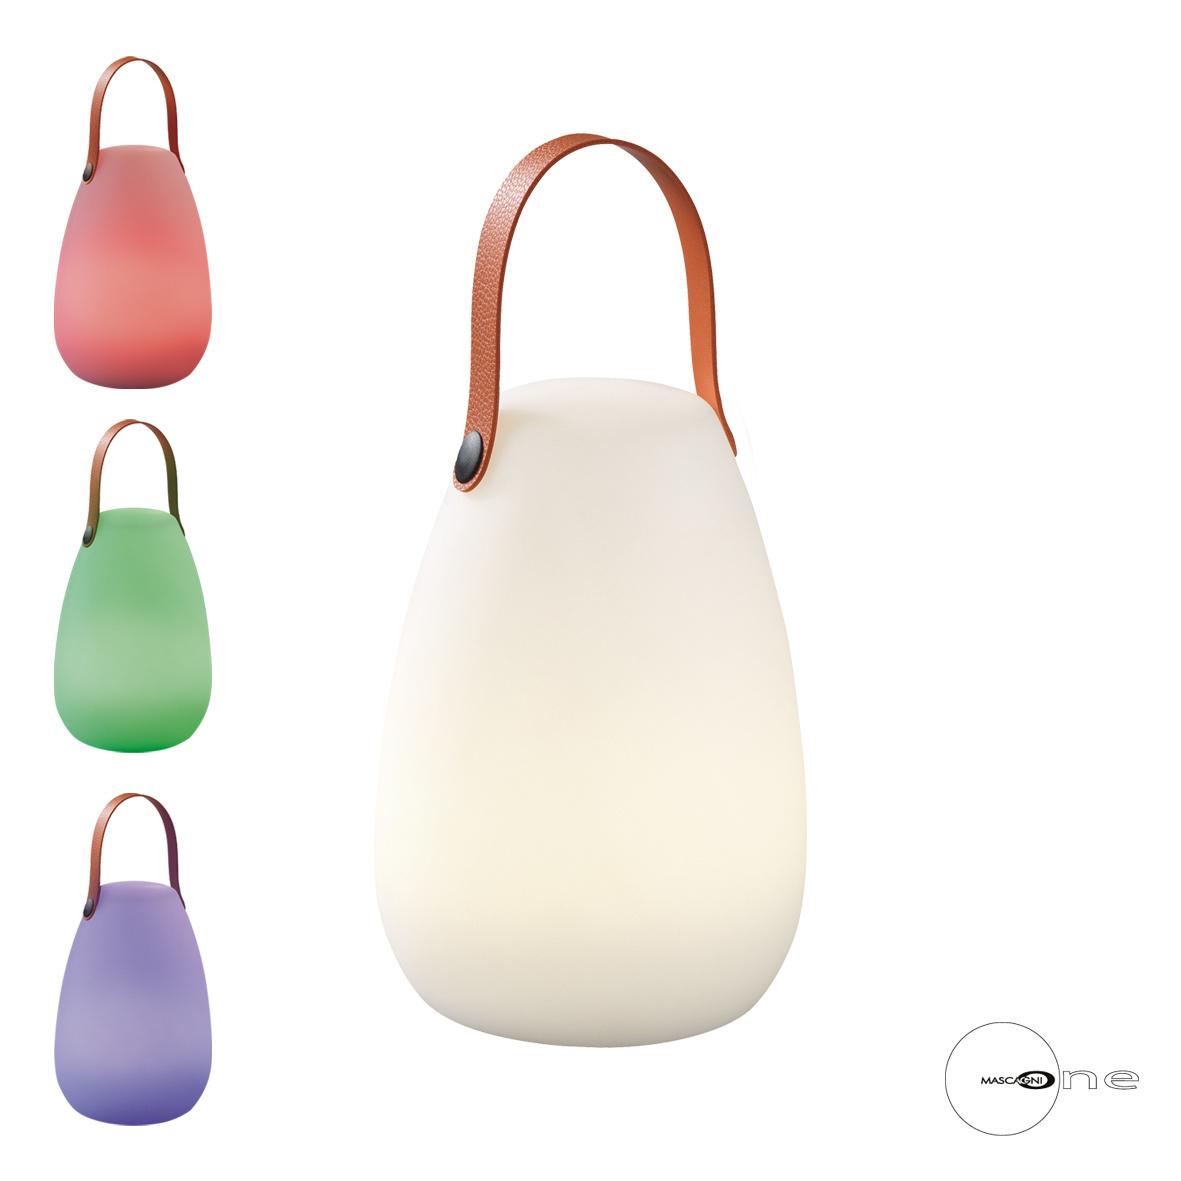 Art Mascagni O1391 RECHARGEABLE LED LAMP